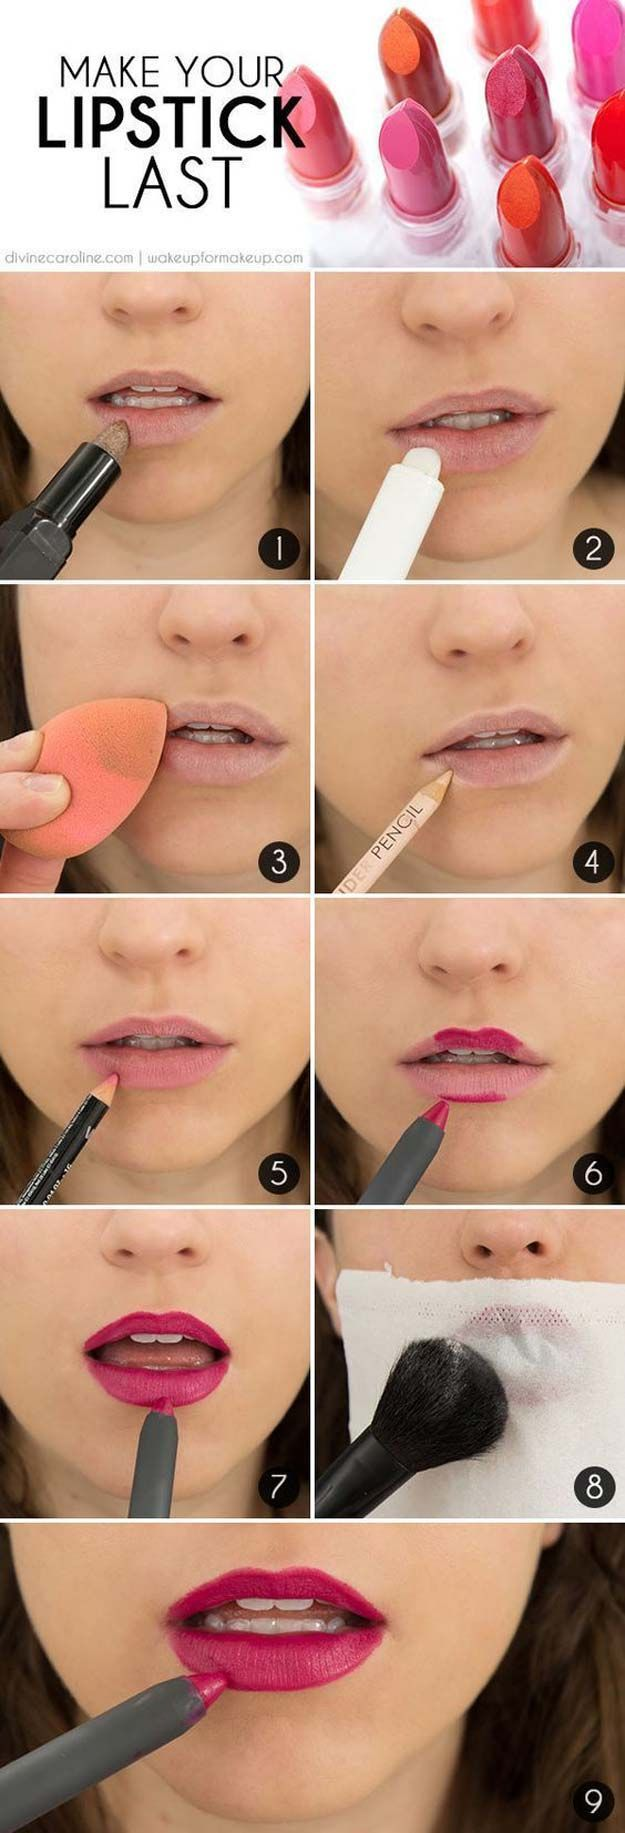 30 der besten Lippenstift-Tutorials aller Zeiten!  – Beauty – #aller #Beauty #be…